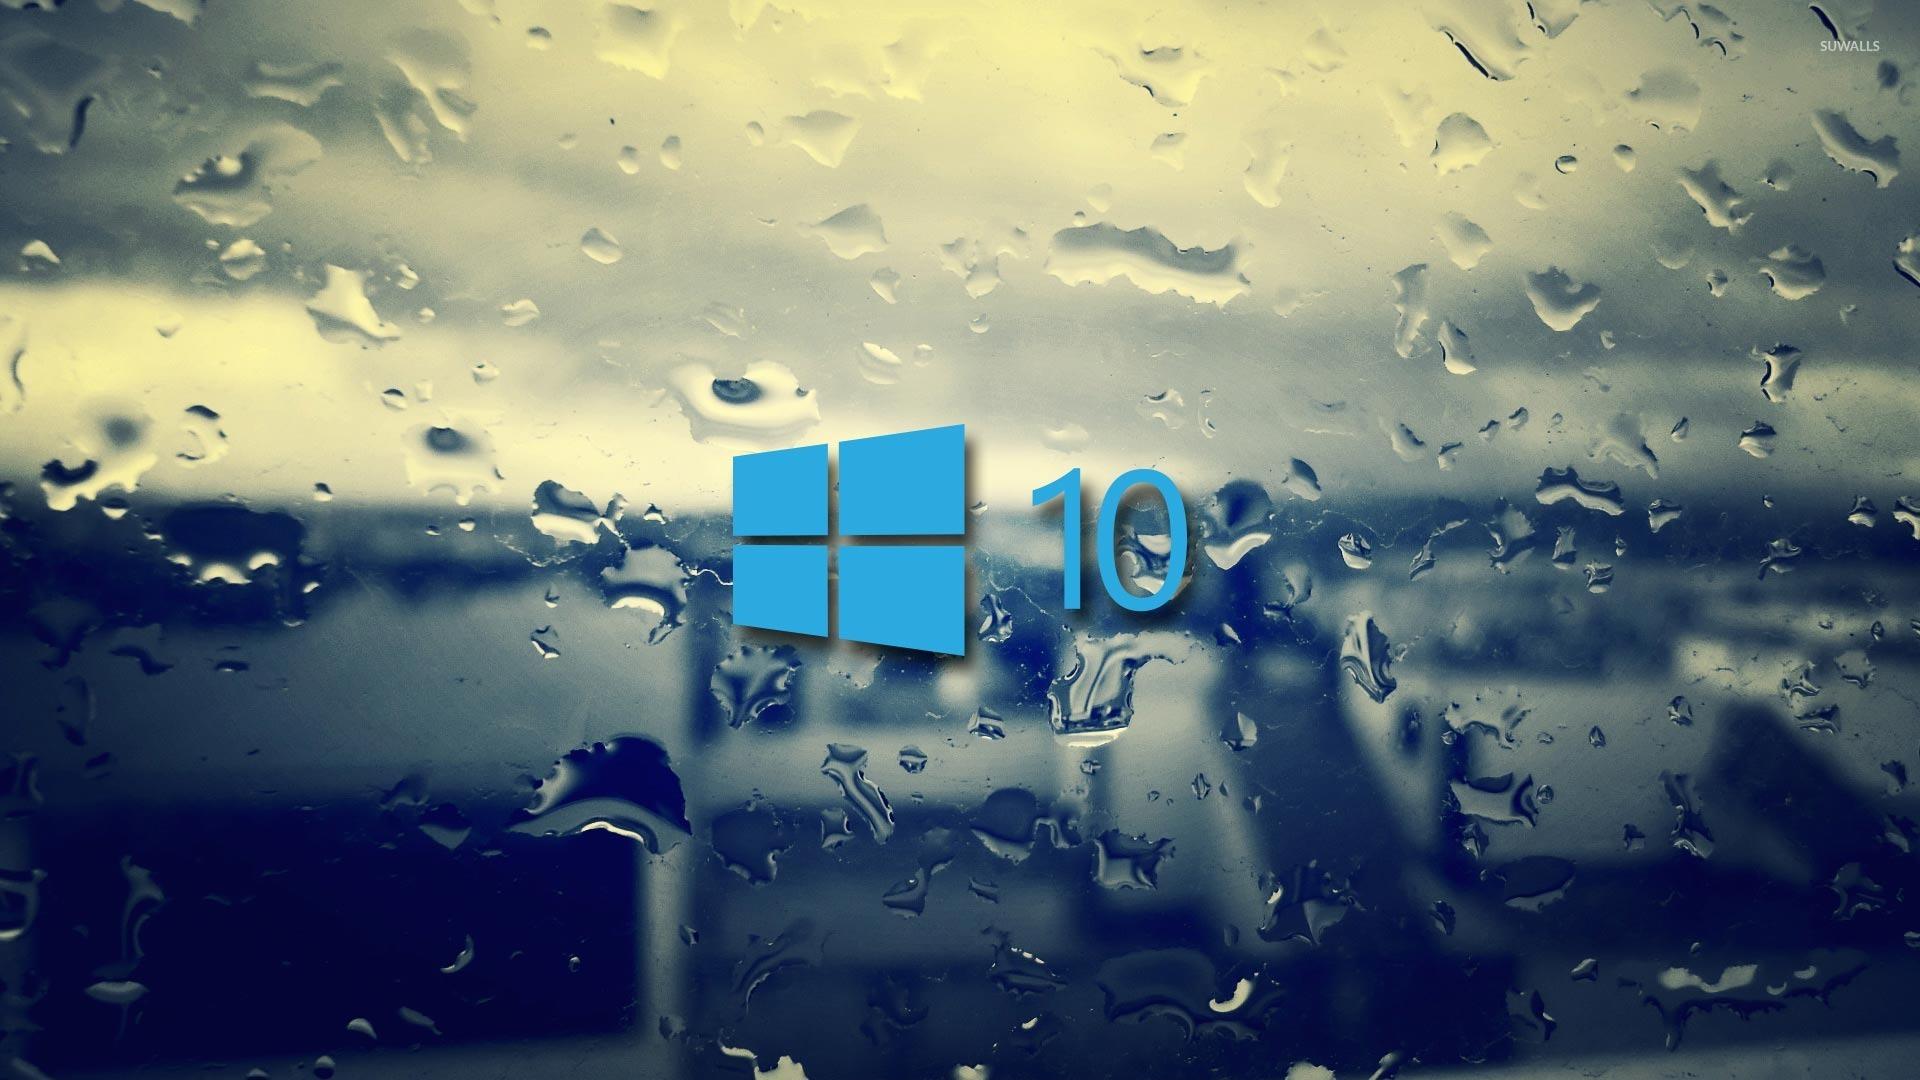 Windows 10 On The Rainy Window 2 Wallpaper